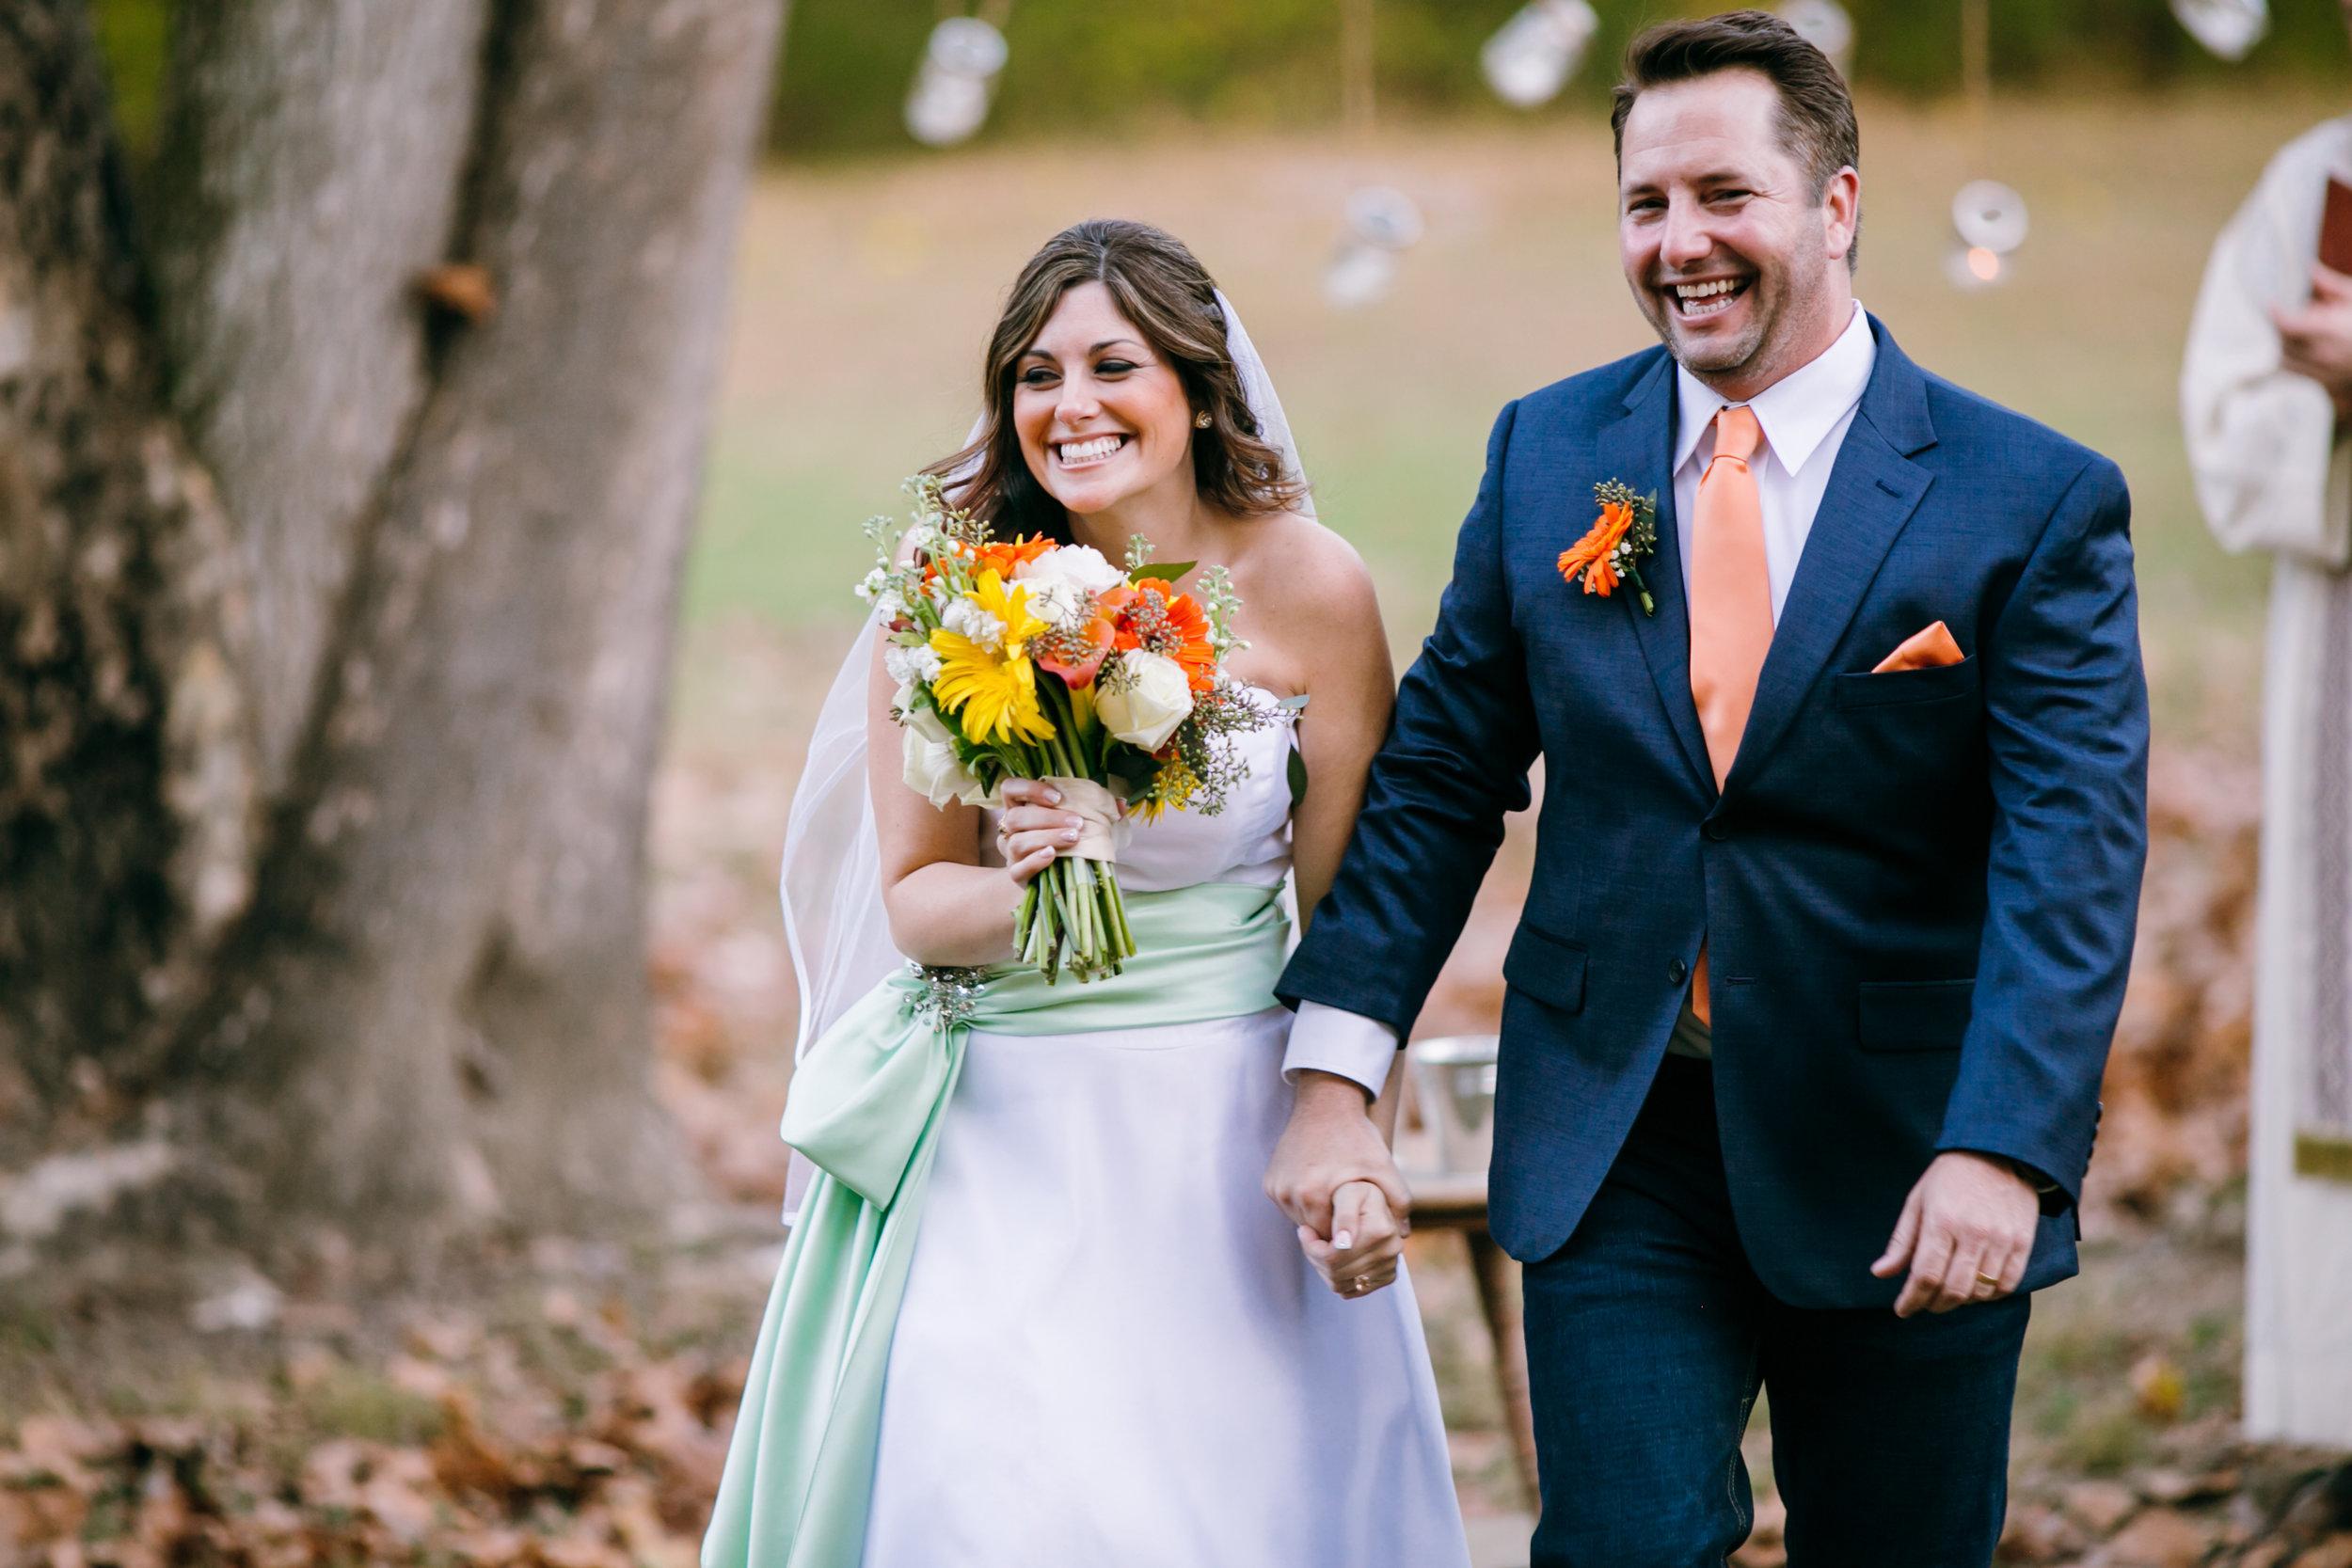 KaraNixonWeddings-Nashville-TN-Wedding-75.jpg